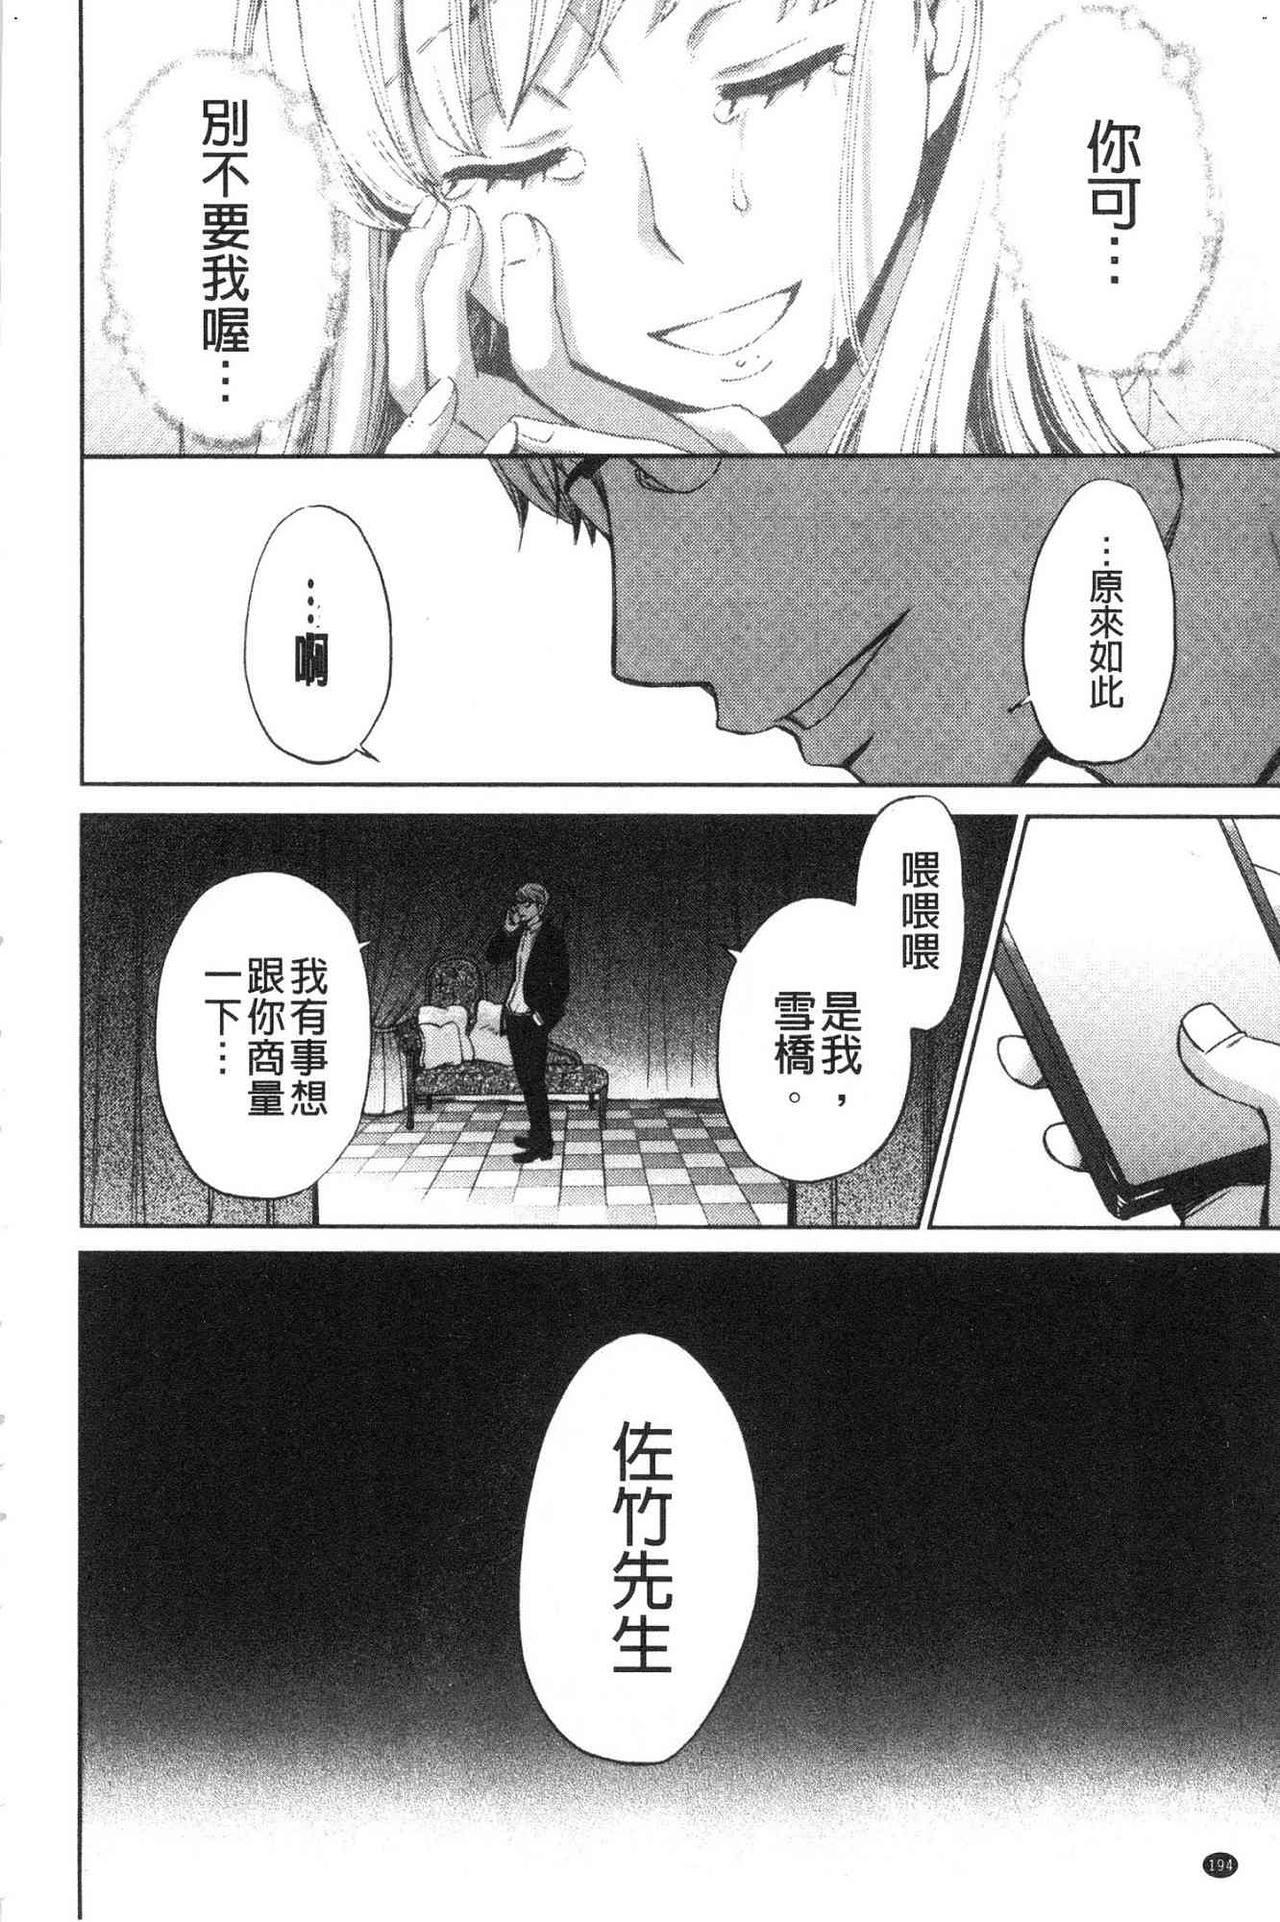 [Gotoh Akira]  21-ji no Onna ~Camera no Mae no Mesuinu~ 2 | 21時之女 ~鏡頭前的牝犬~ 2 [Chinese] 195